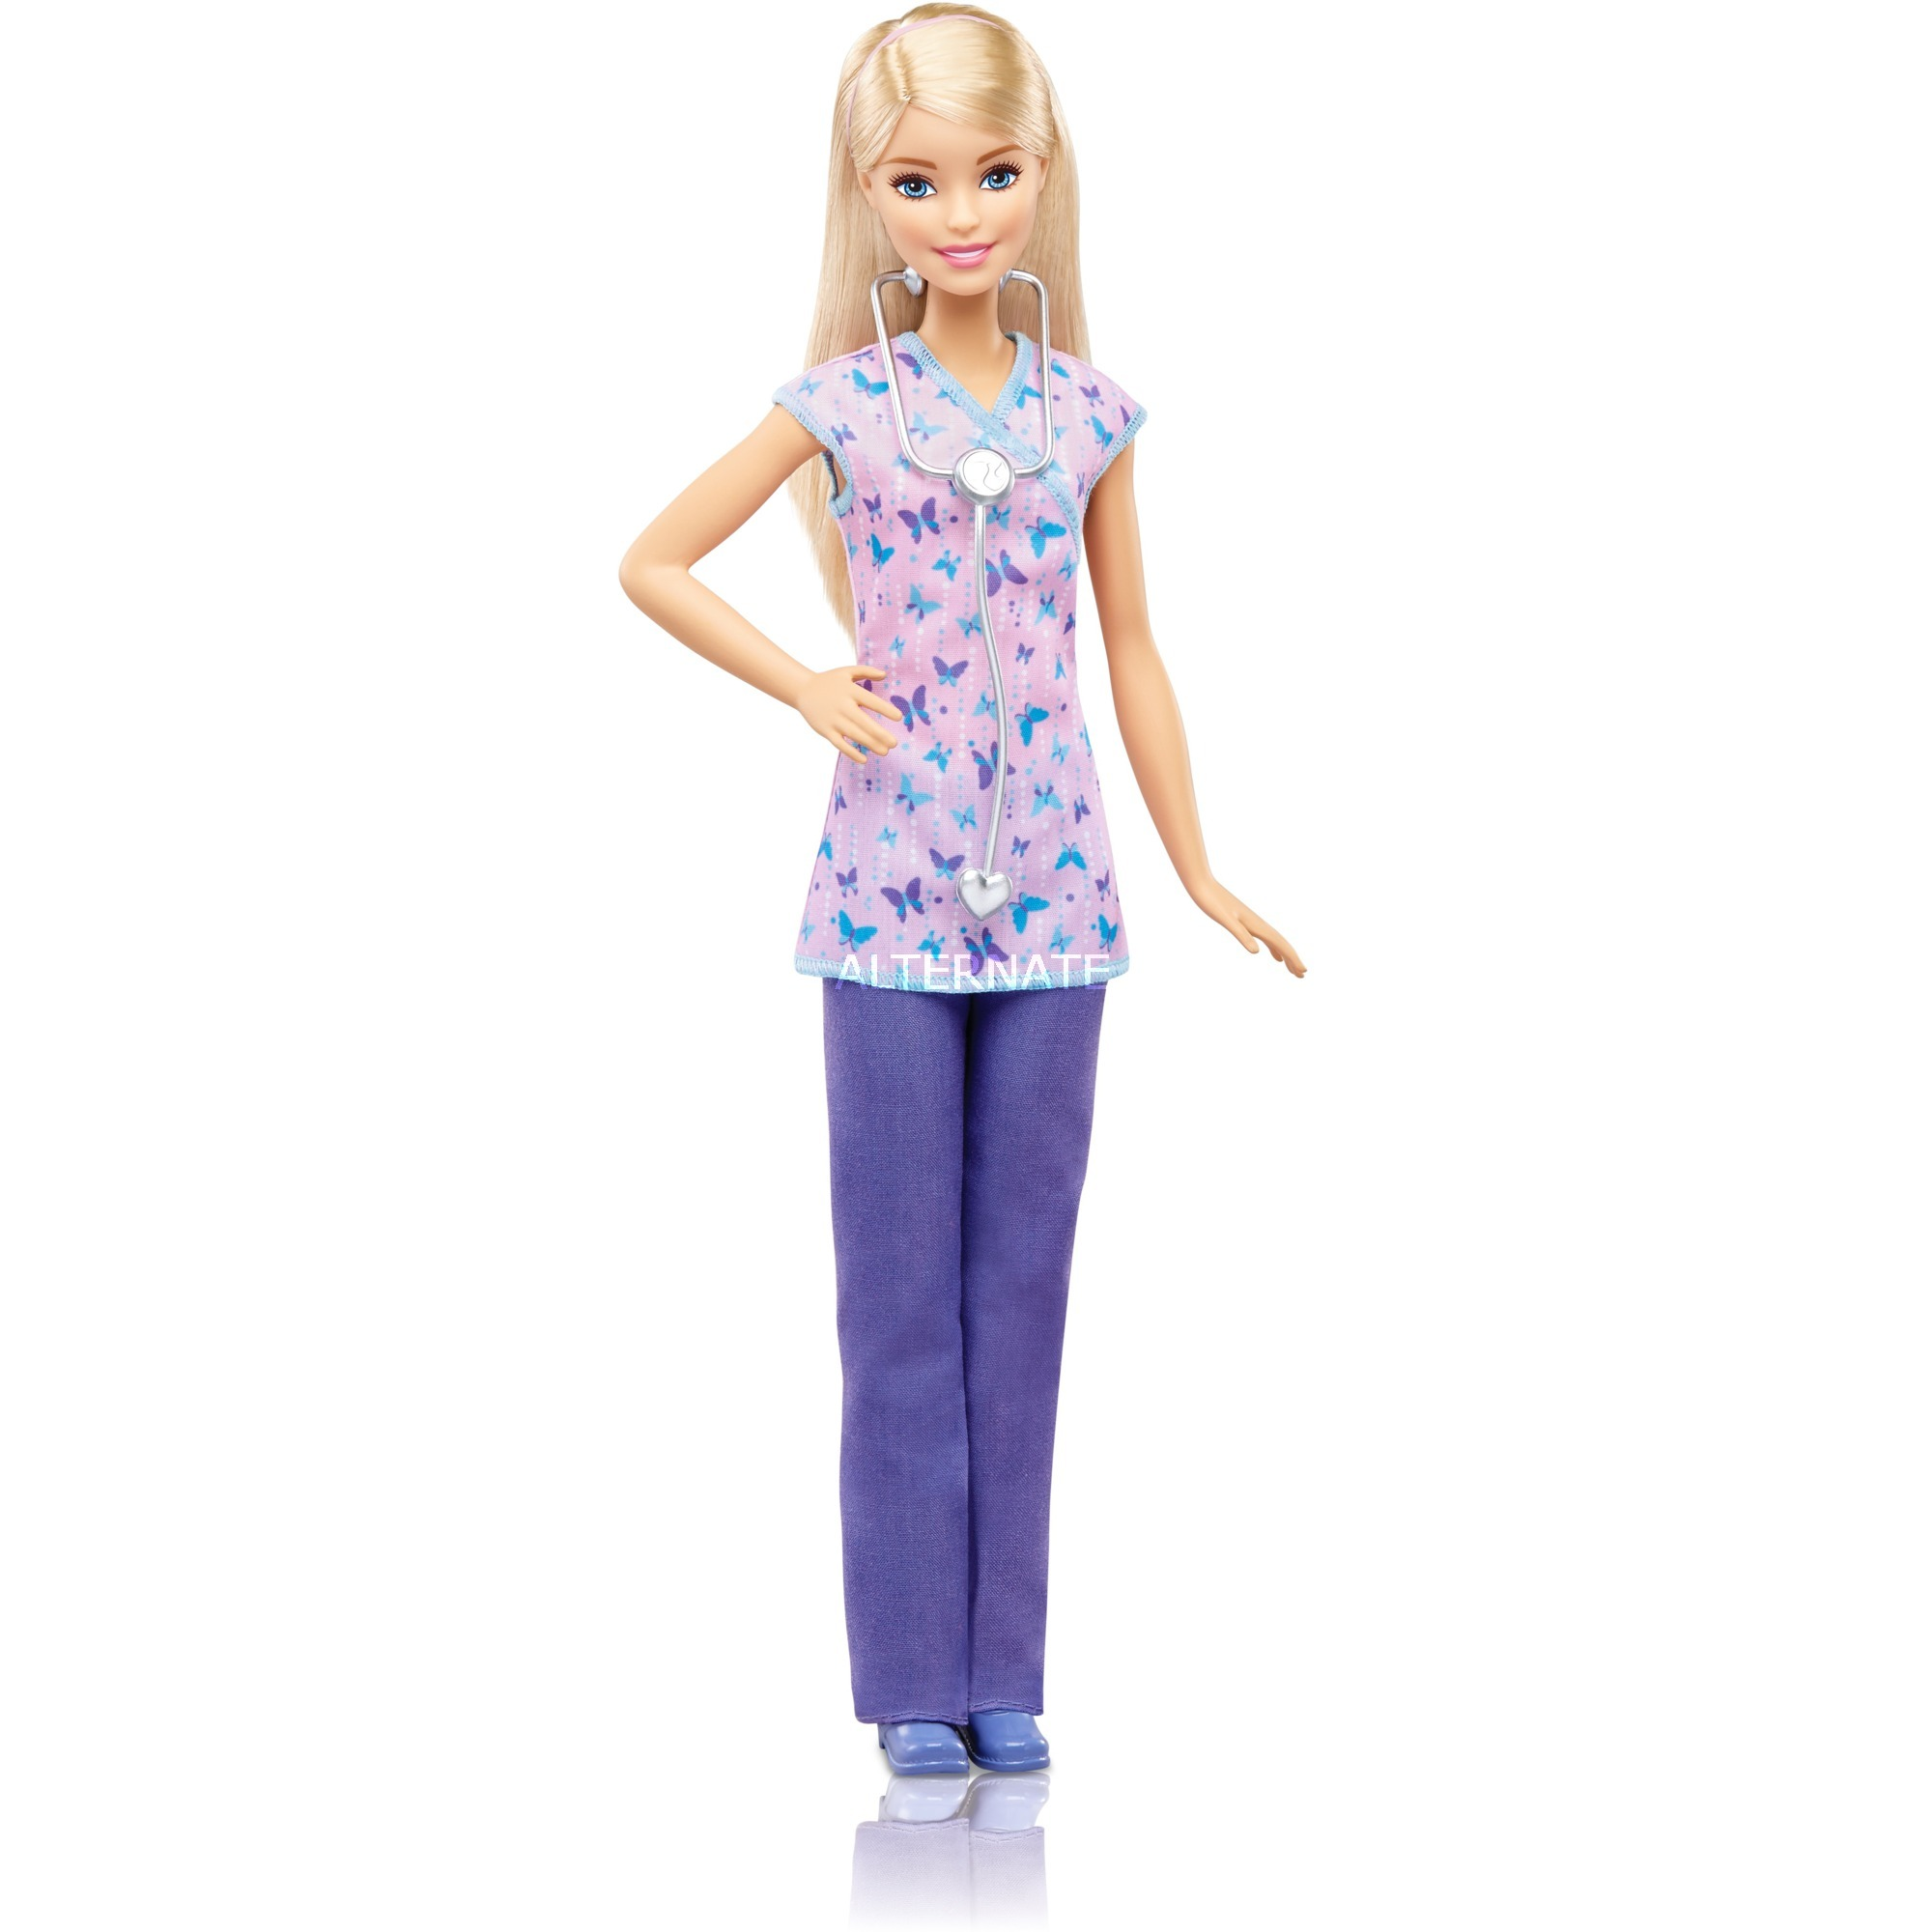 Barbie - Enfermera Pantalón Lila - Muñeca Yo Puedo Ser